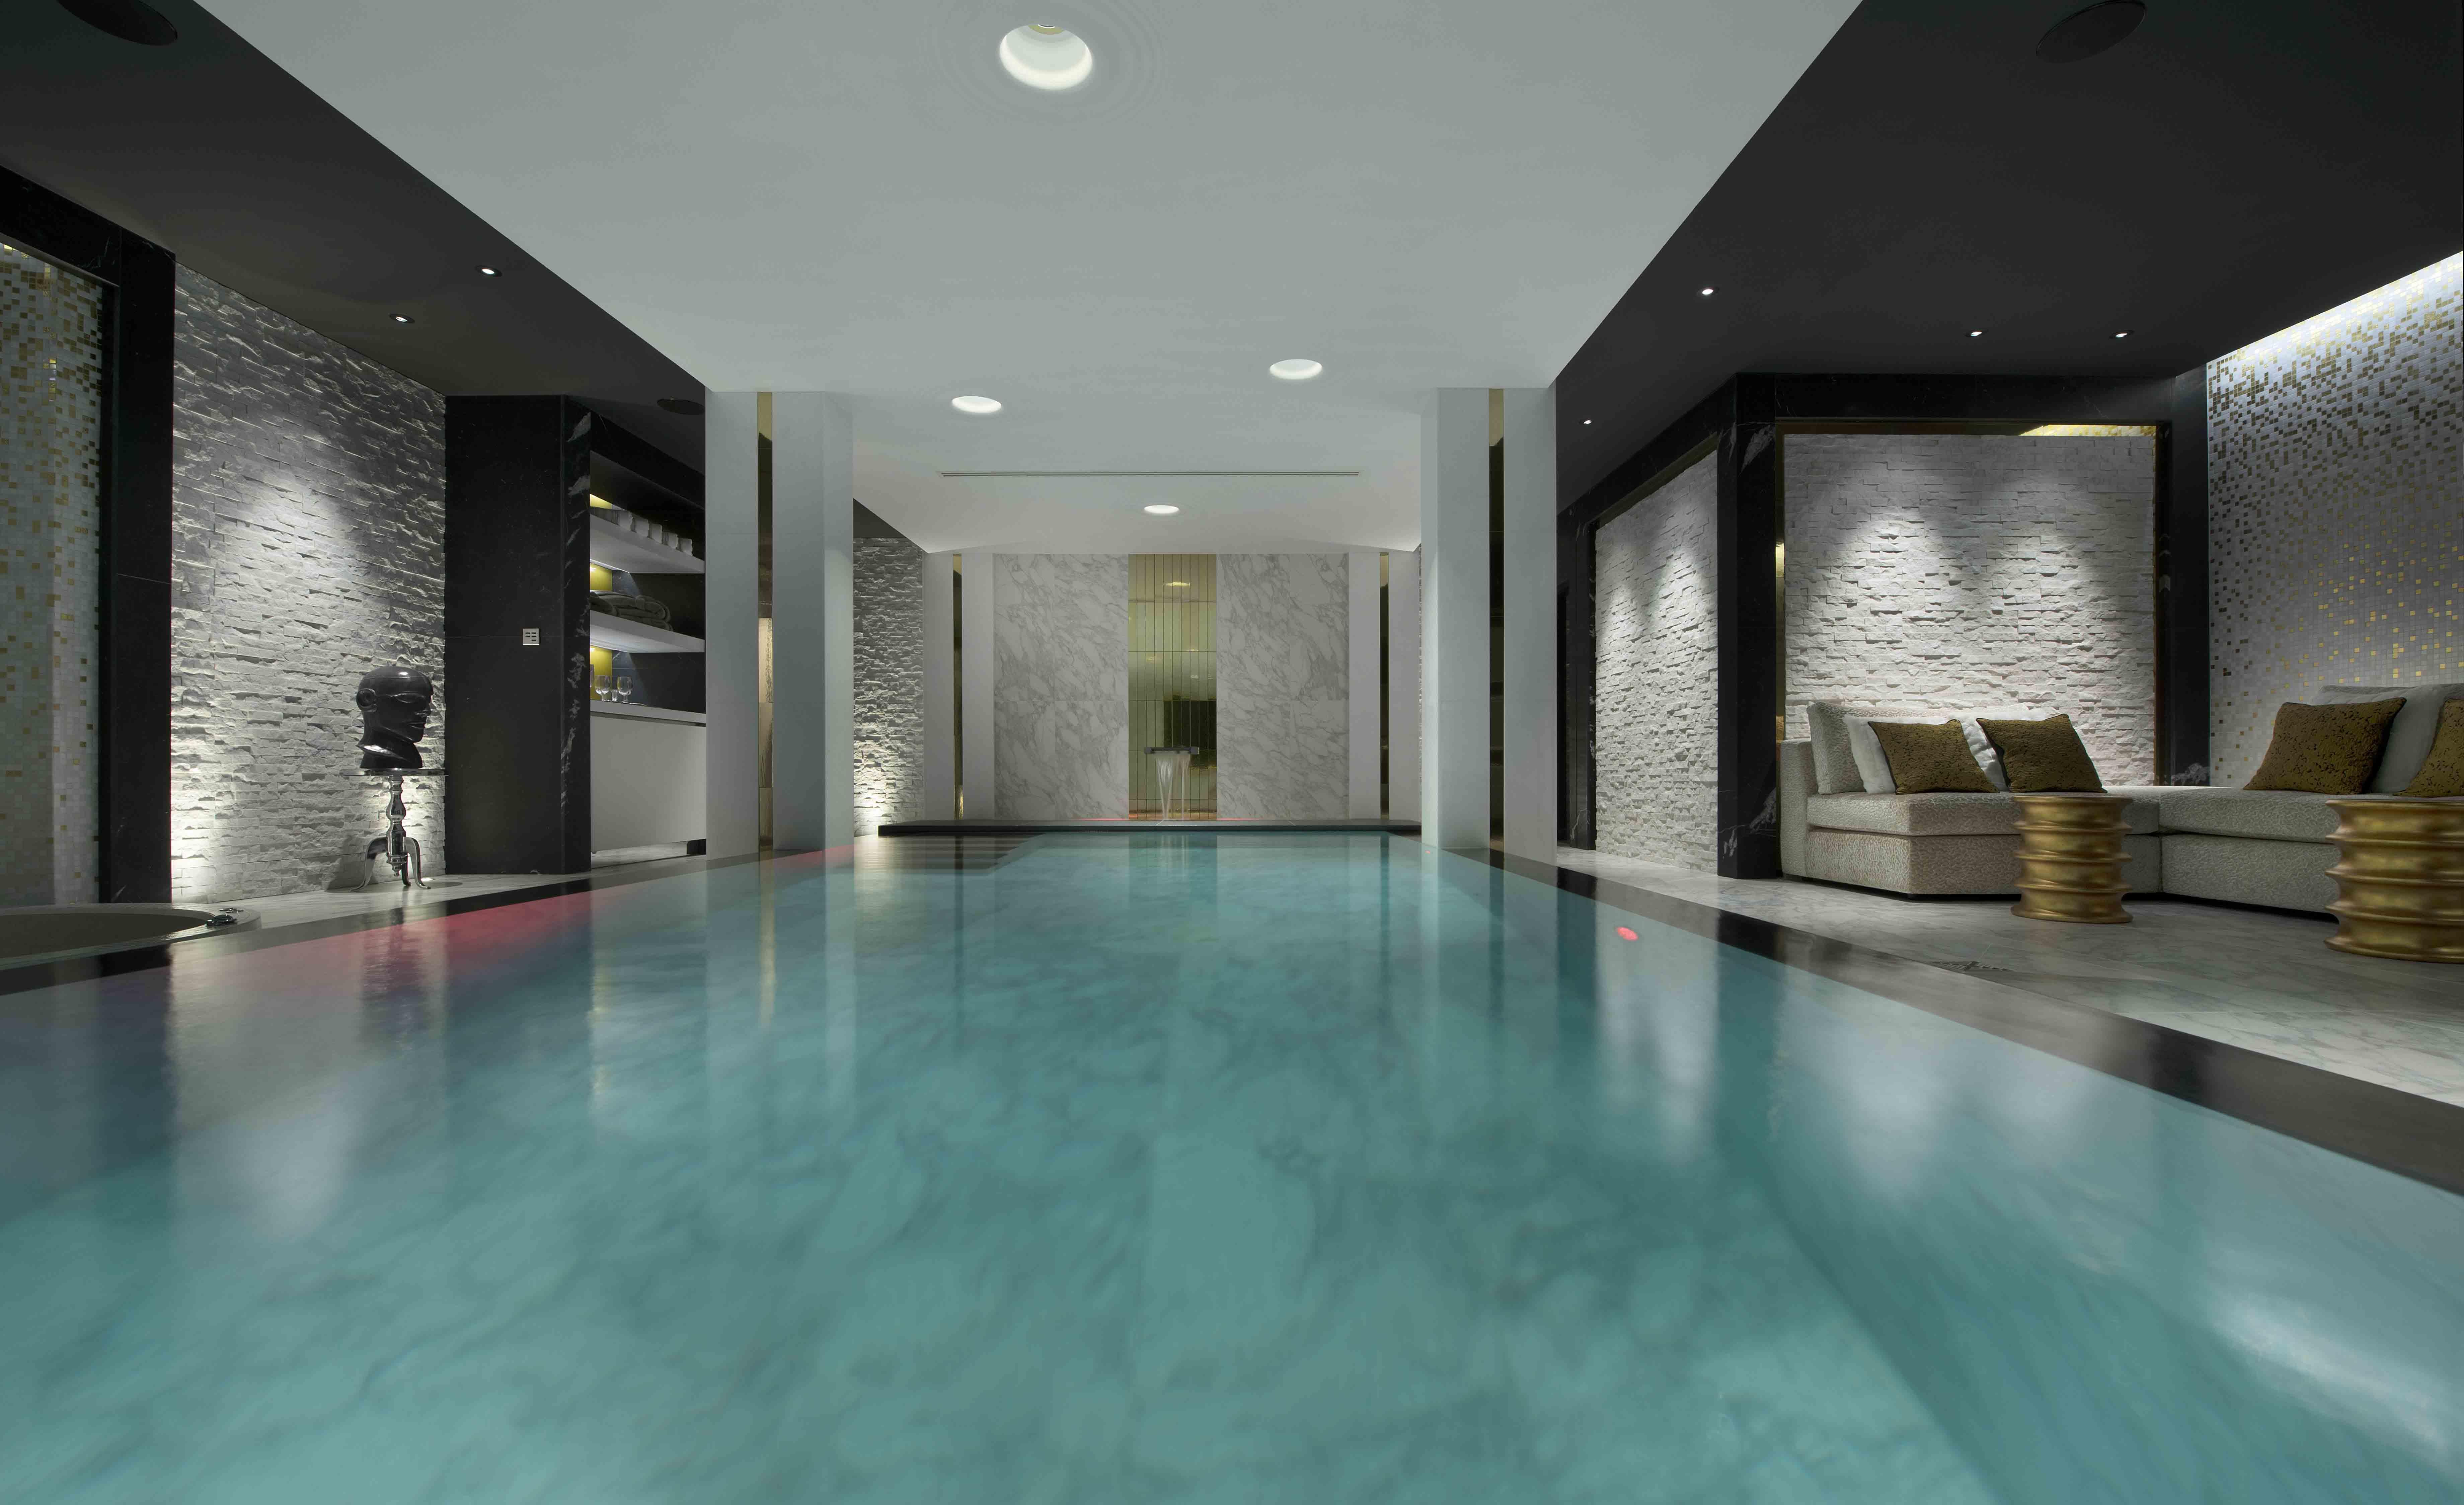 Inspirational Hot Tub Cleaning Service Photos Of Bathtub Decoration